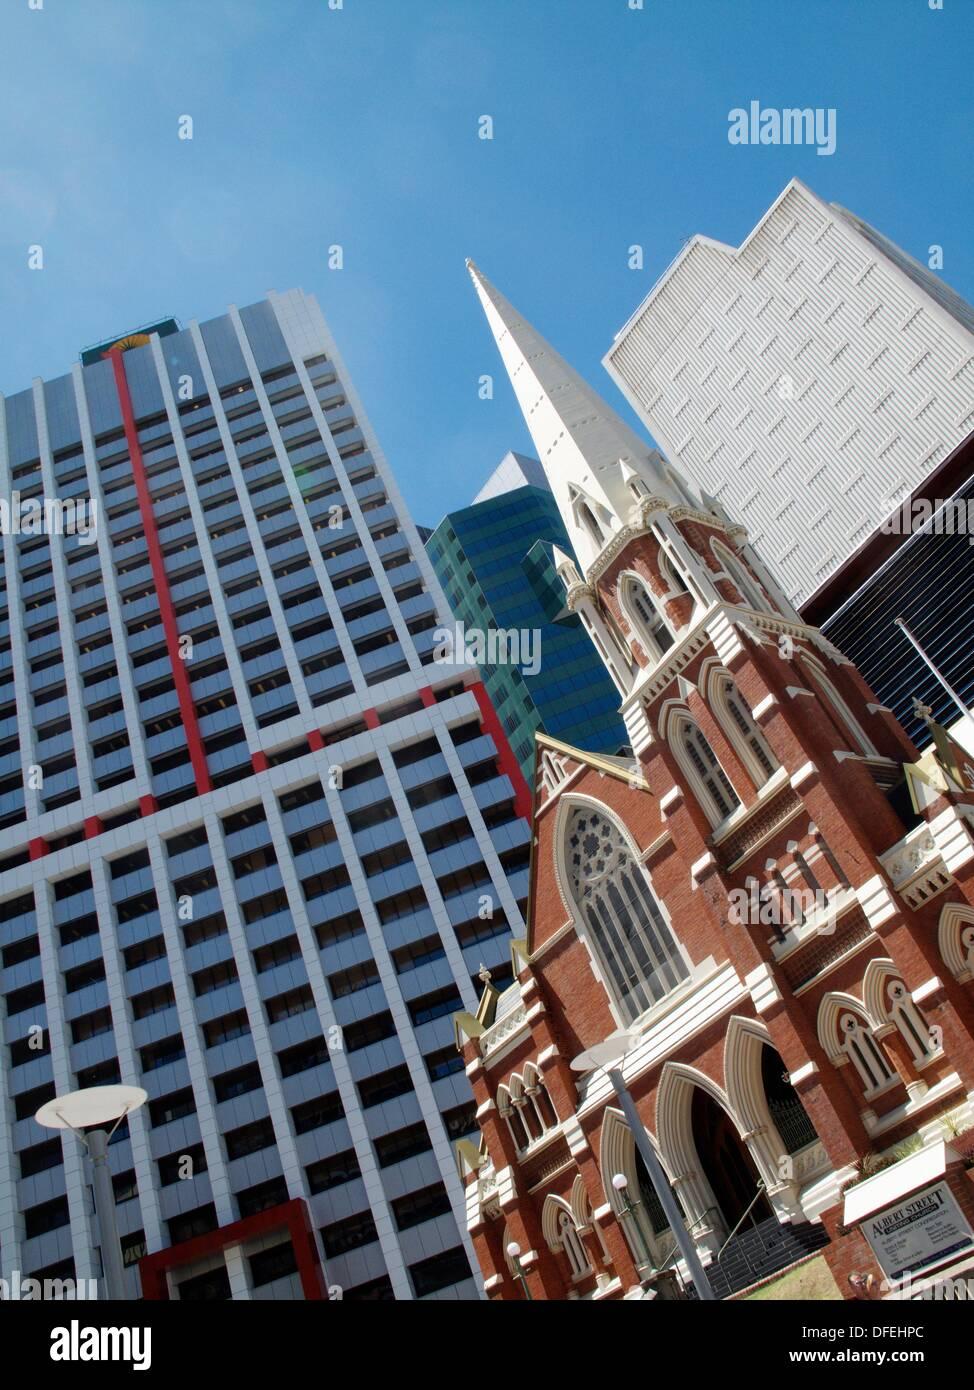 Albert Street Uniting Church in central Brisbane, Queensland, Australia - Stock Image